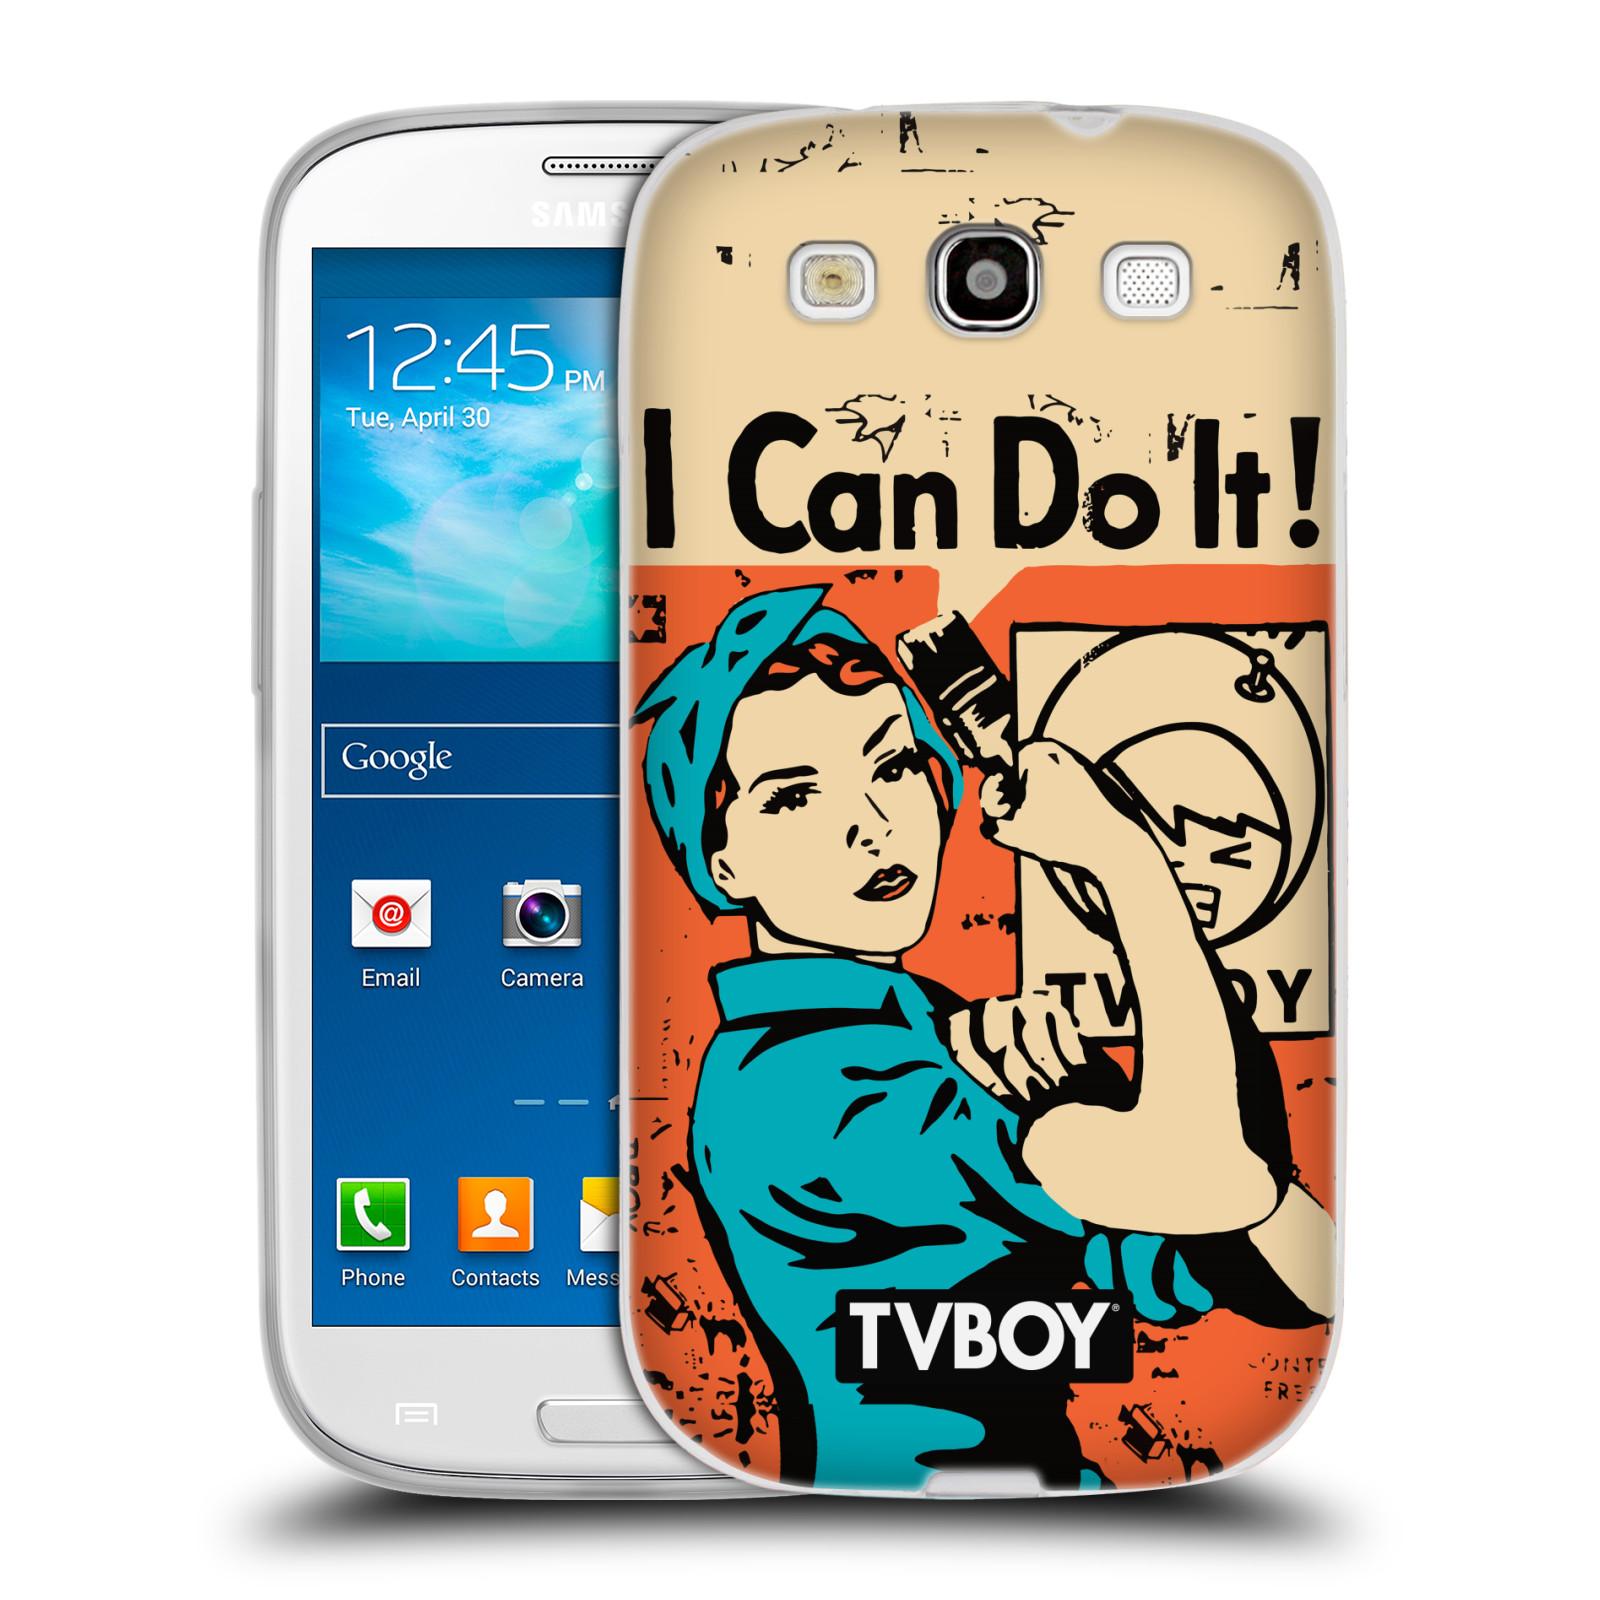 Silikonové pouzdro na mobil Samsung Galaxy S III HEAD CASE - TVBOY - I can do it (Silikonový kryt či obal na mobilní telefon s licencovaným motivem TVBOY pro Samsung Galaxy S III GT-i9300)